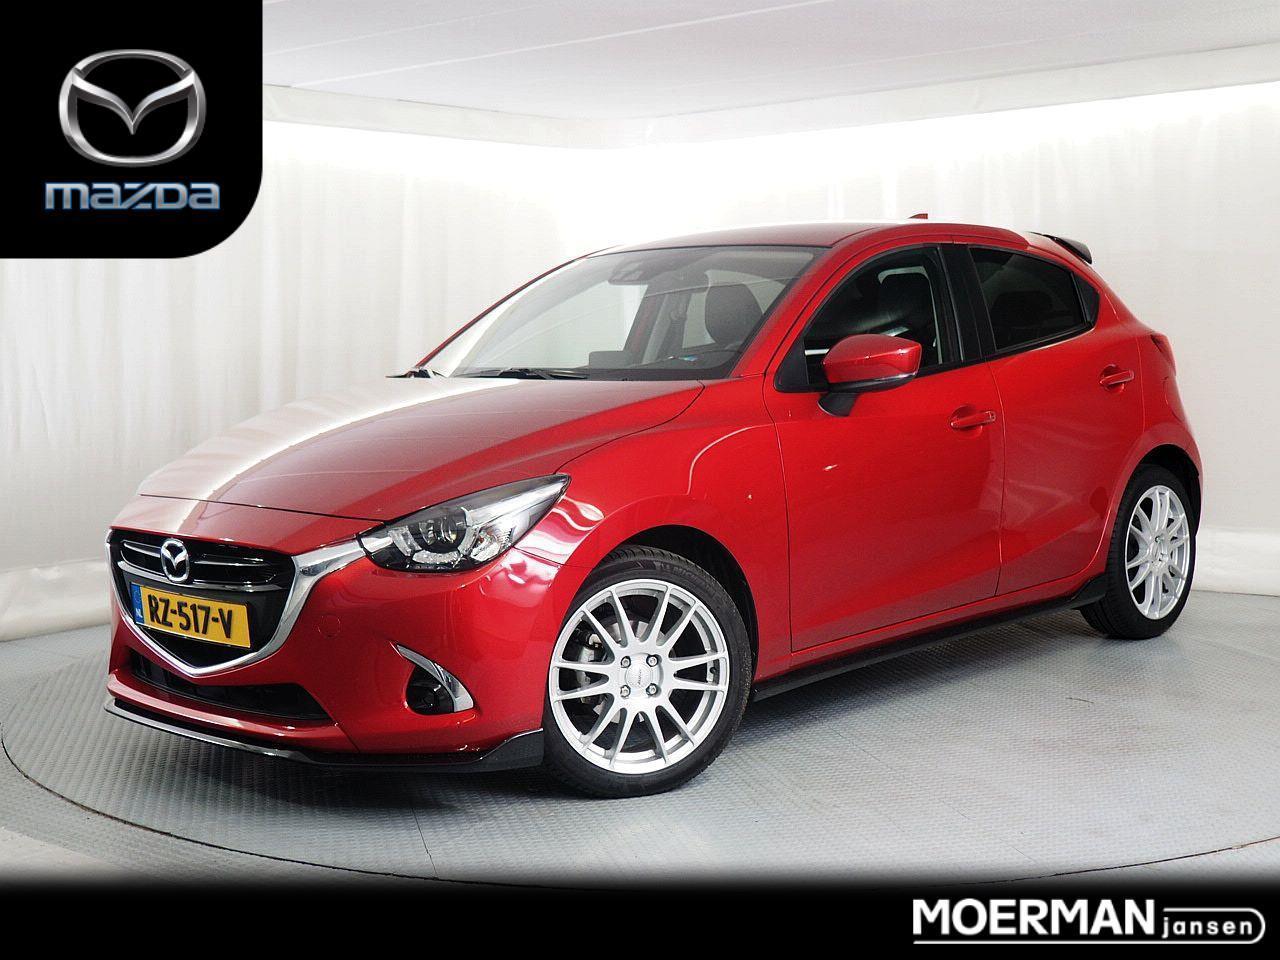 Mazda 2 1.5 skyactiv-g gt-luxury / aero pakket / 17 inch velgen / dealer onderhouden / 1e eig / navigatie / leder